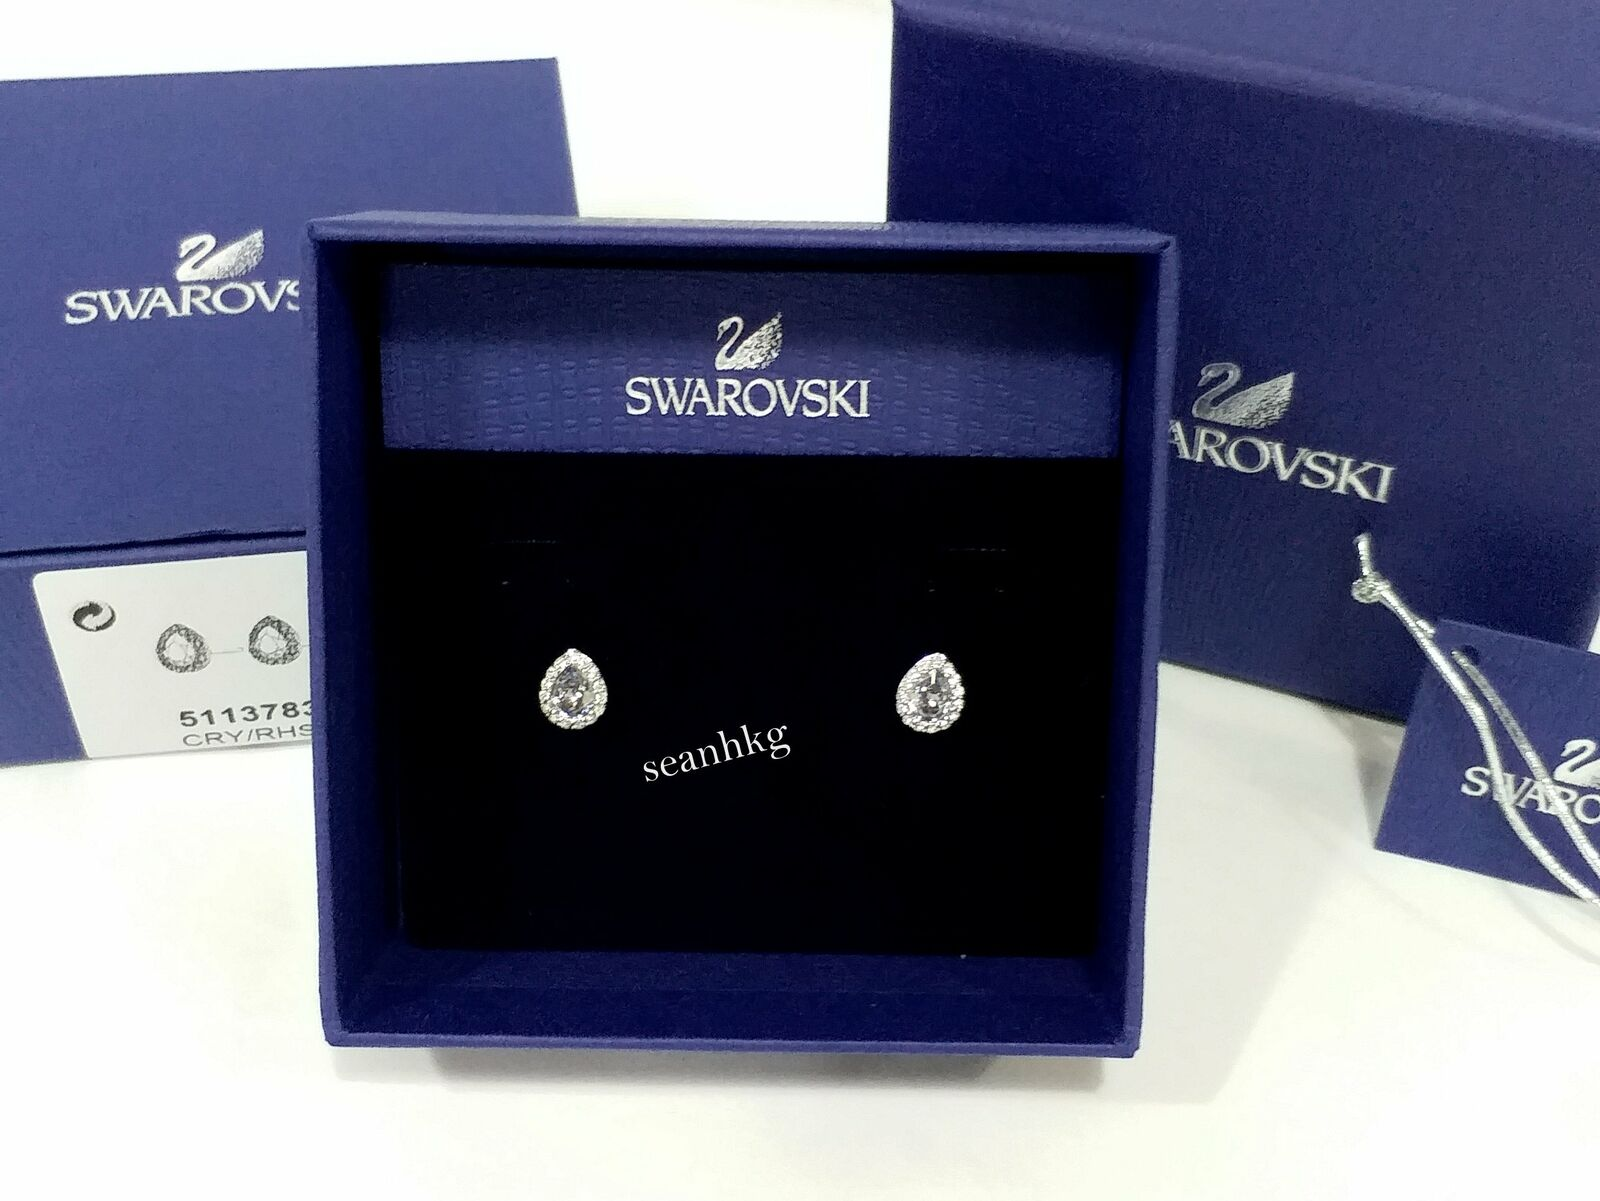 Swarovski Christie Pear Pierced Earrings Dark bluee crystal Authentic MIB 5113783